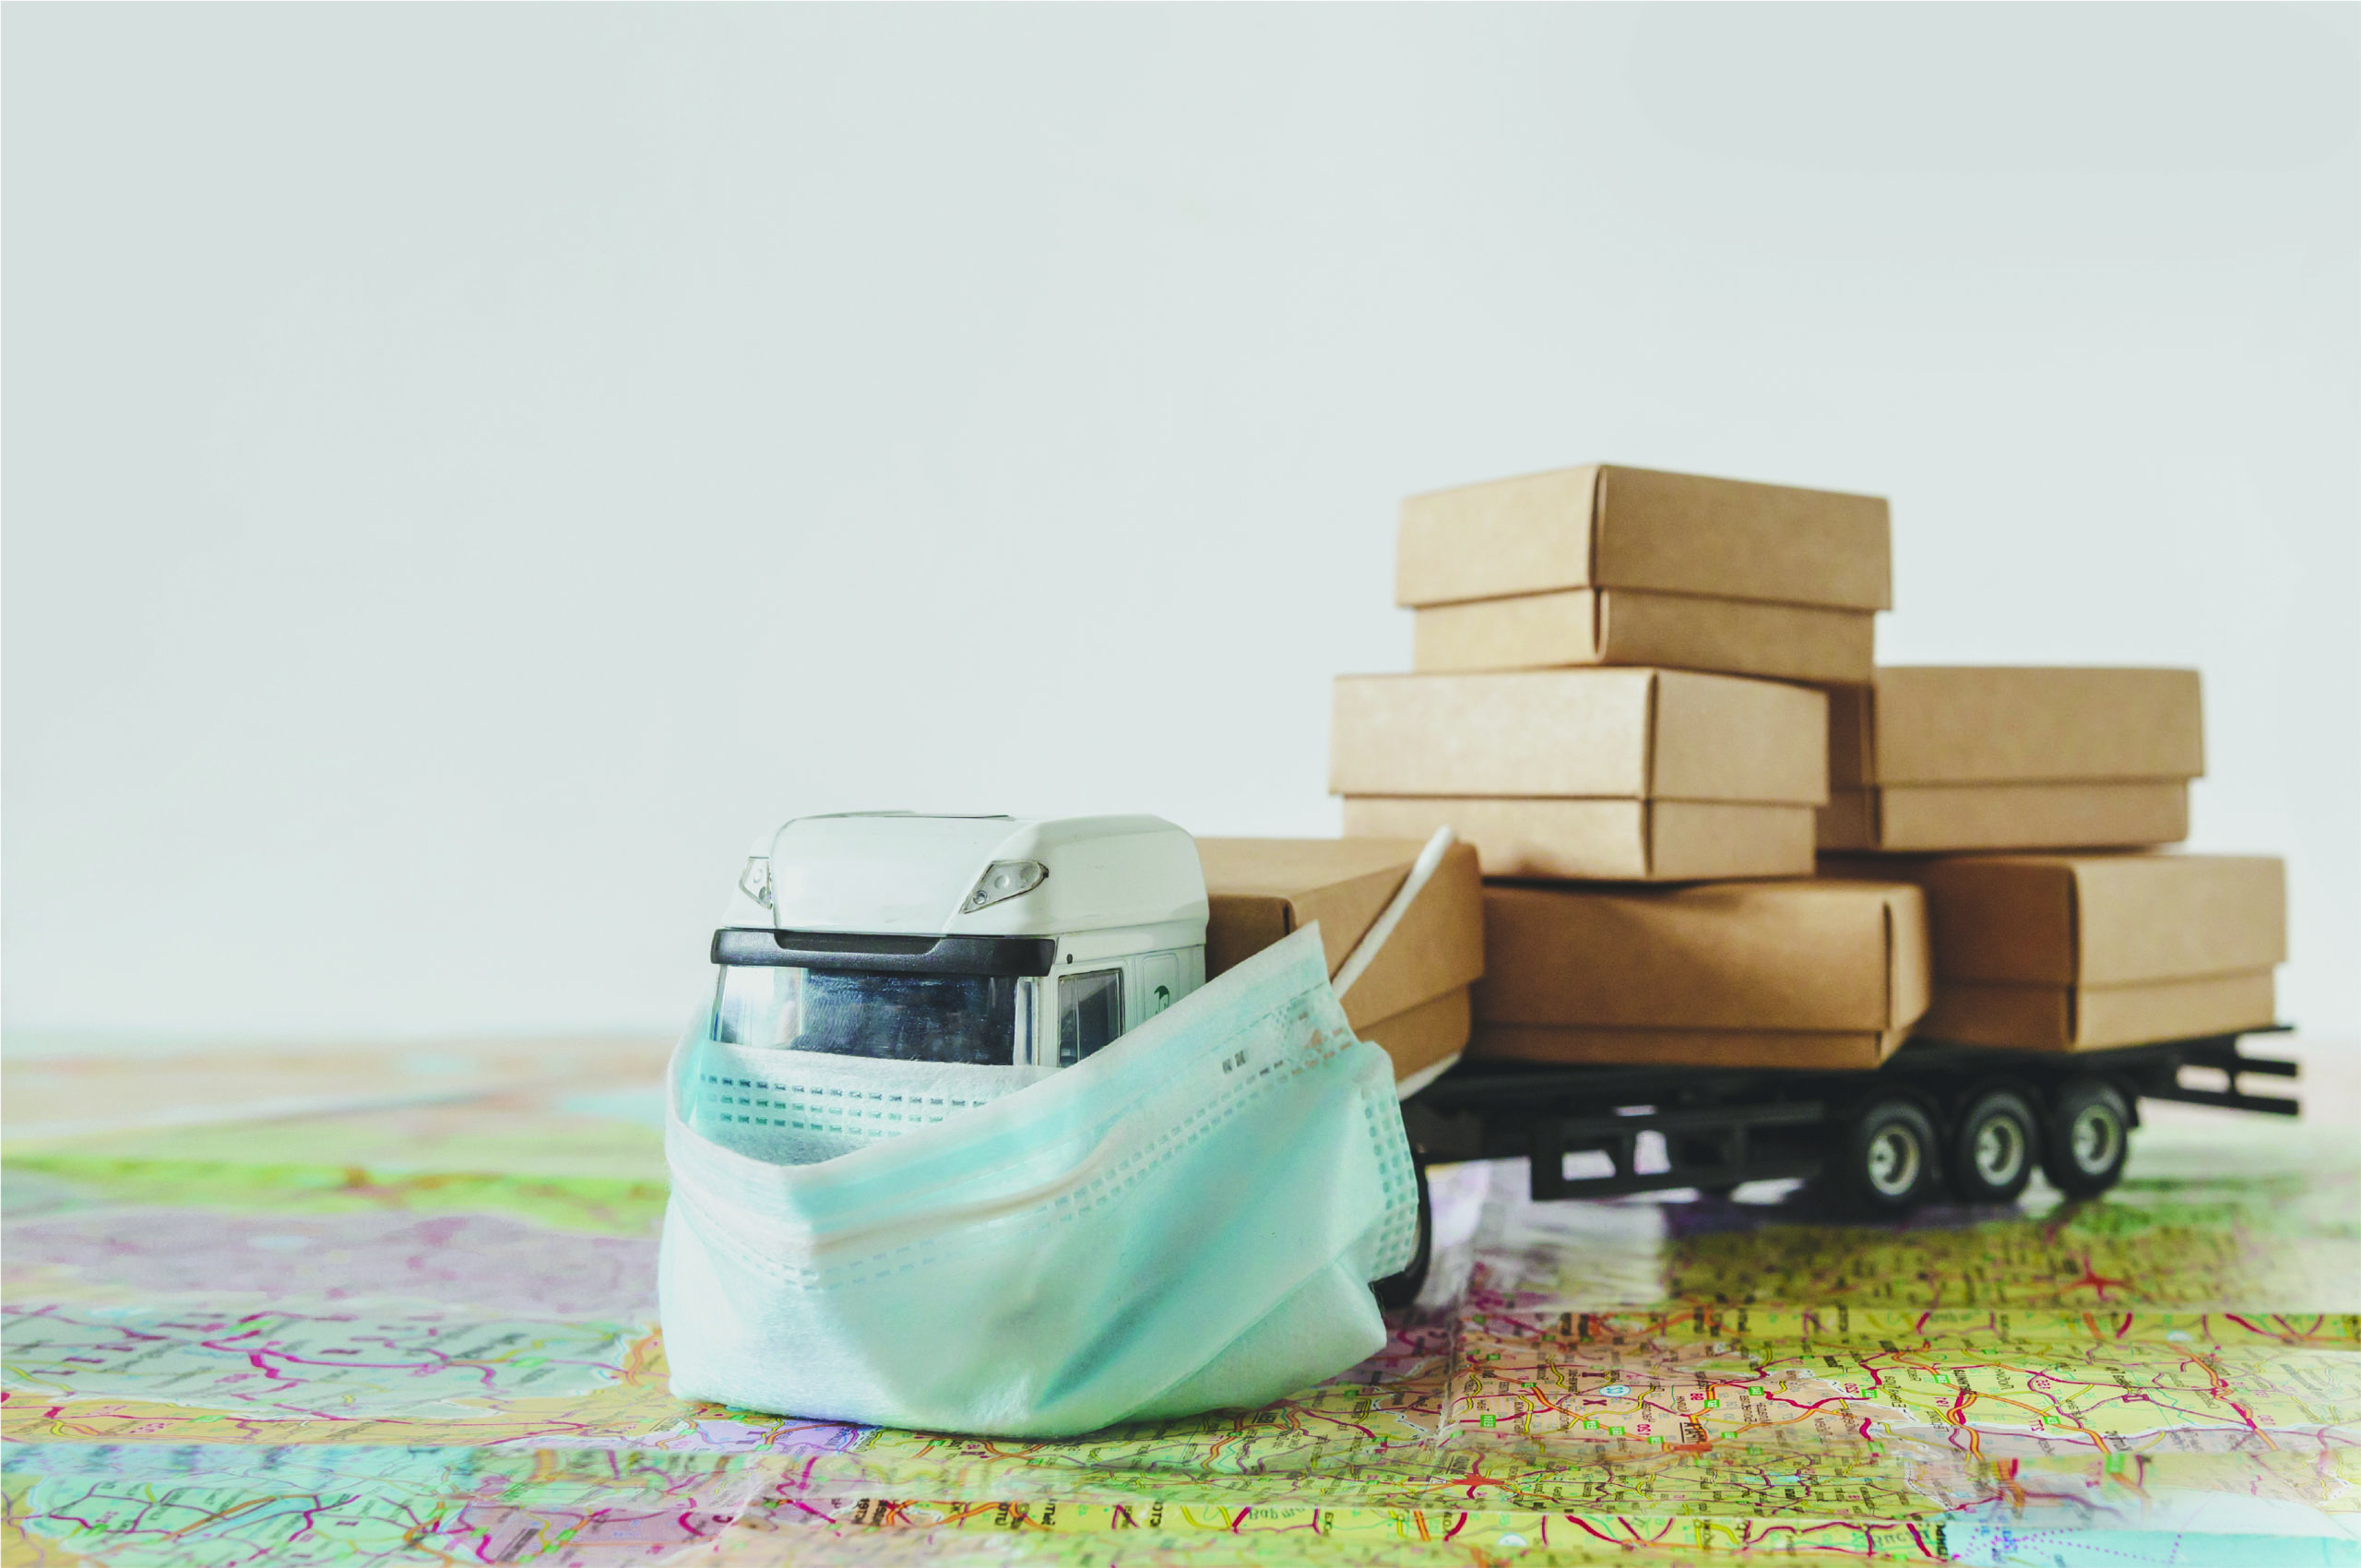 COVID-19 Preparation: Supply Chain Disruption & Manufacturing